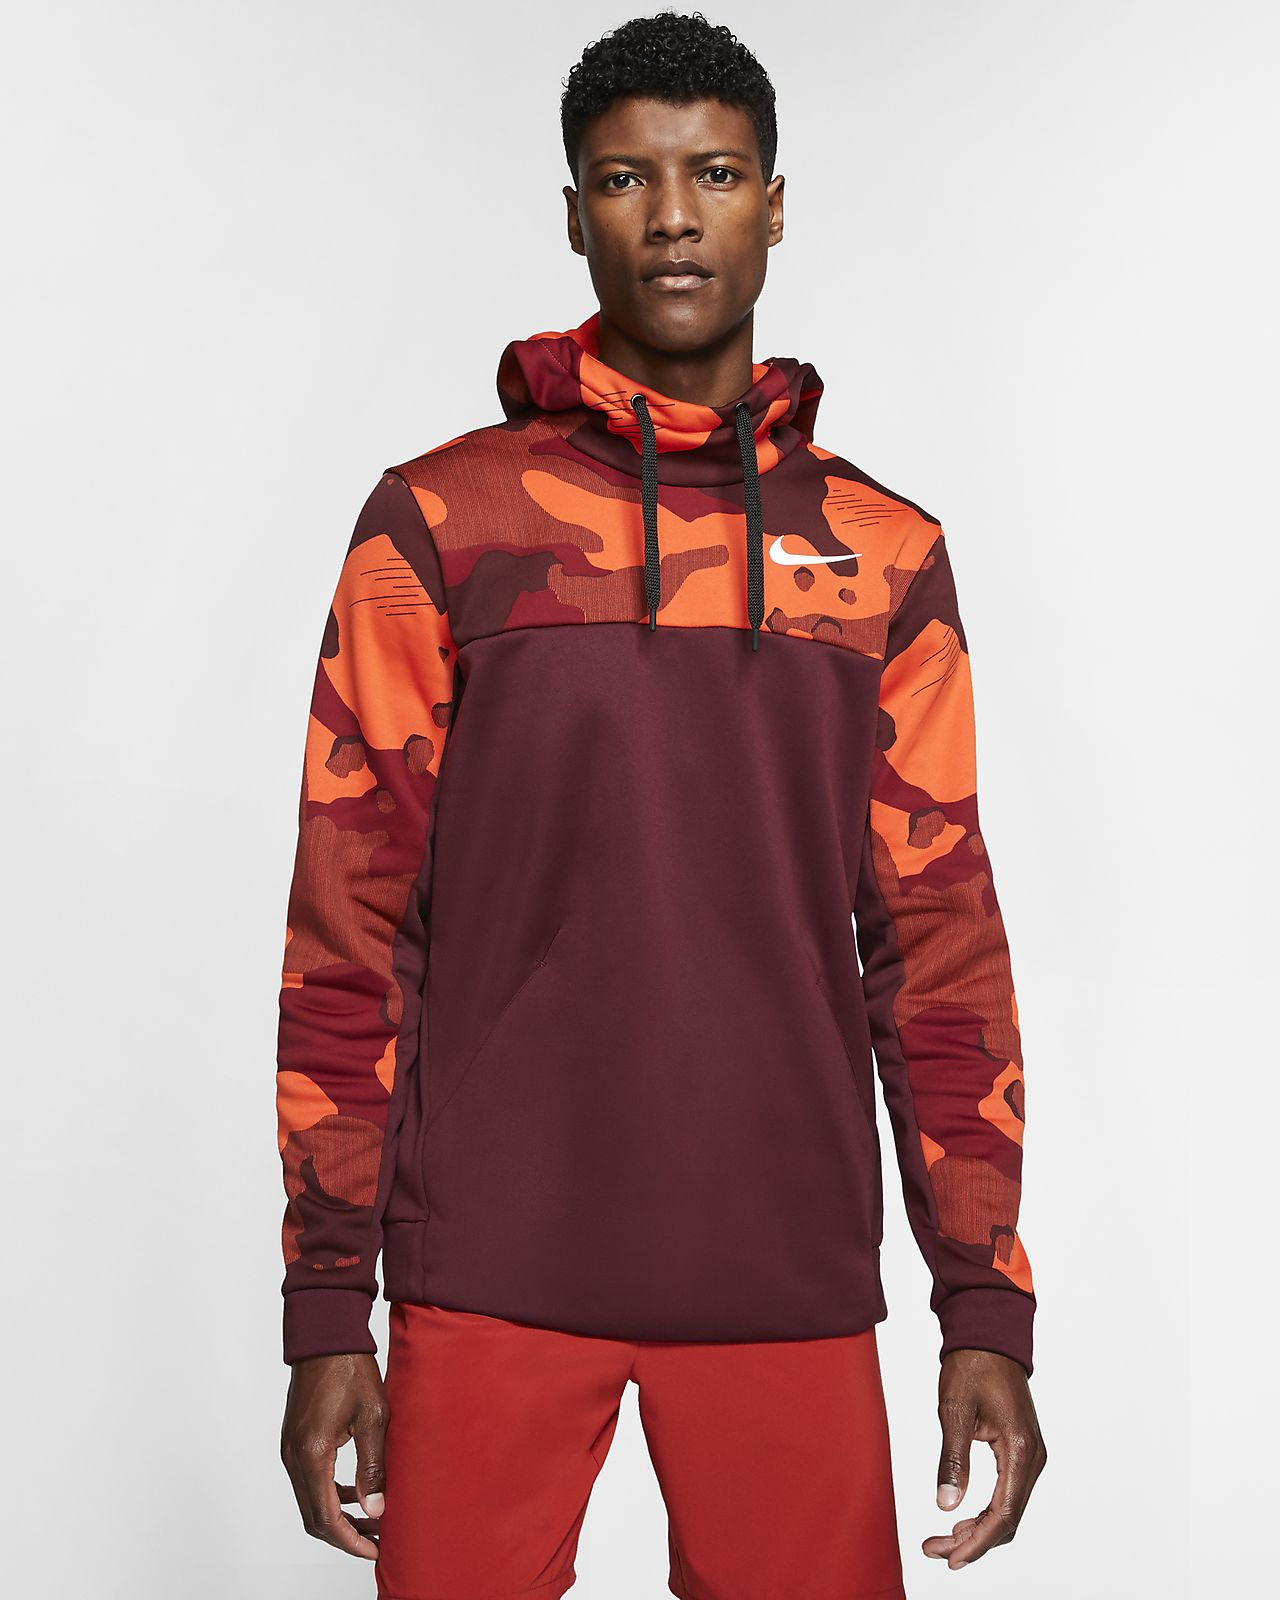 Hoodie pullover de treino Nike Therma para homem